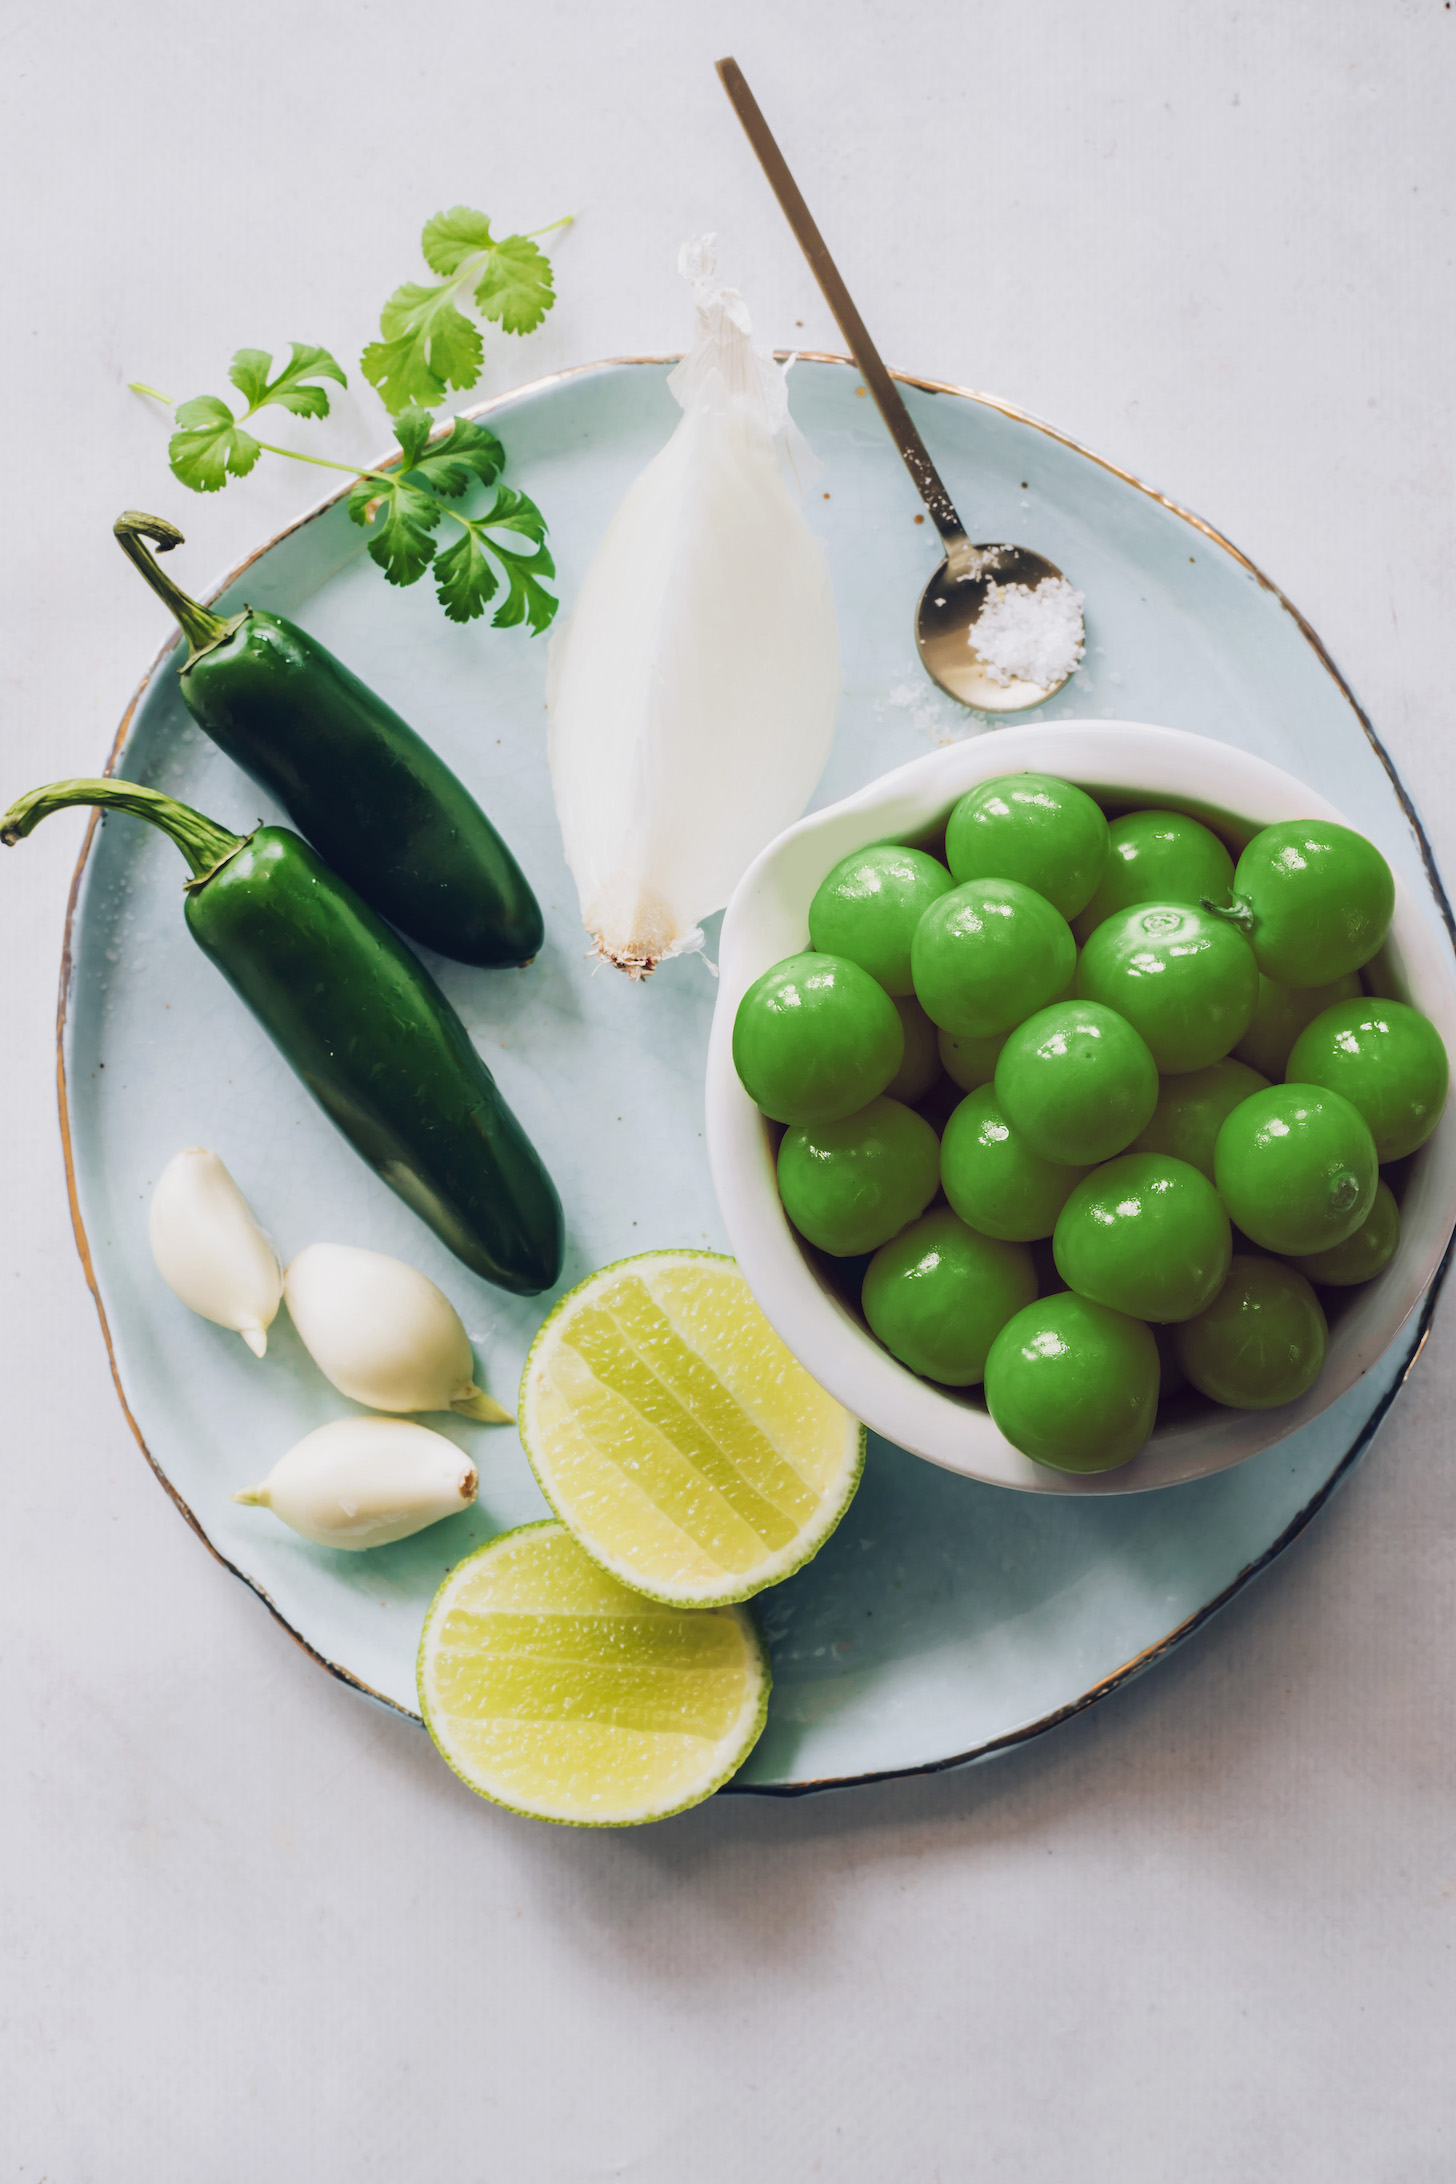 Tomatillos, onion, salt, limes, garlic, jalapeño, and cilantro